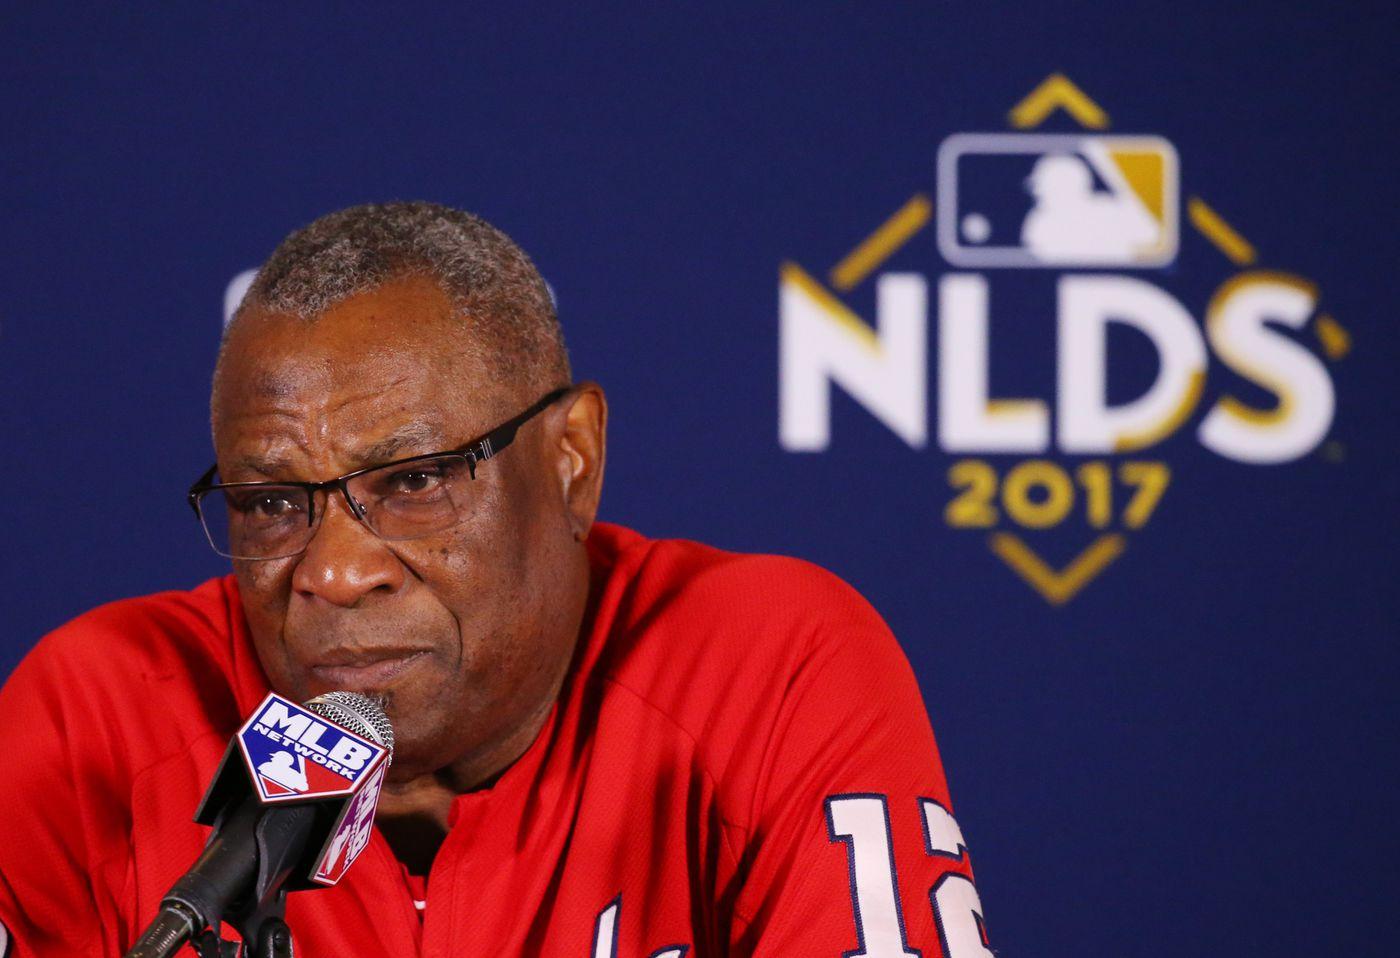 MLB Playoffs 2017: Storytime with Washington Nationals' skipper